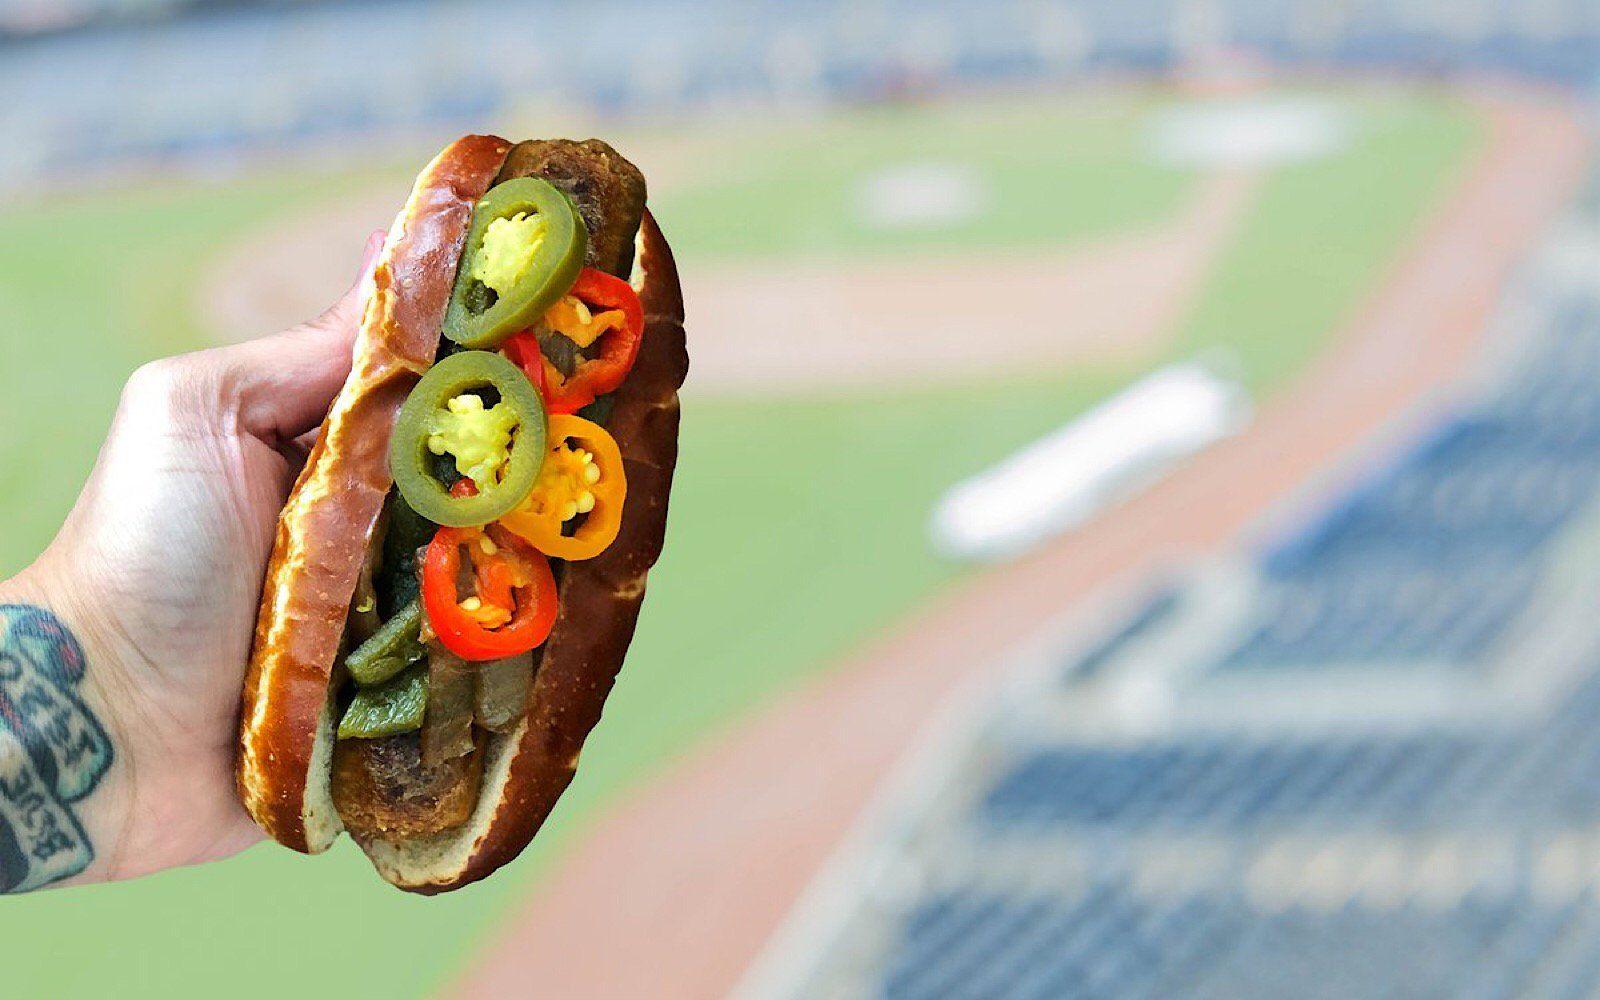 The Plant Based Beyond Sausage Now Served In Yankee Stadium Vegan News Vegan Vegan Options